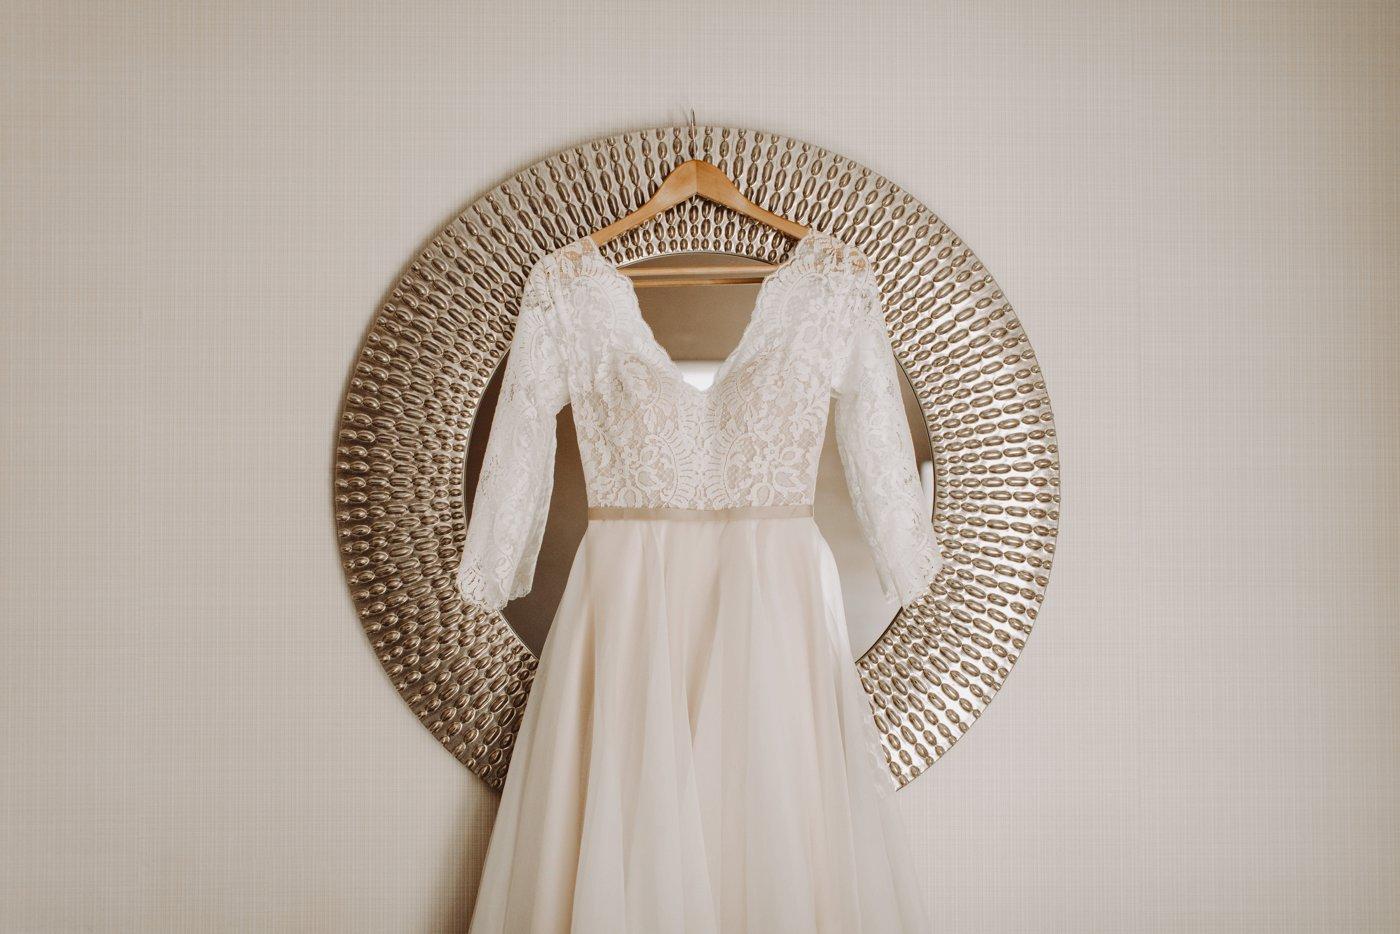 wedding dress details Mt. Washington Mill Dye House Baltimore wedding photographer